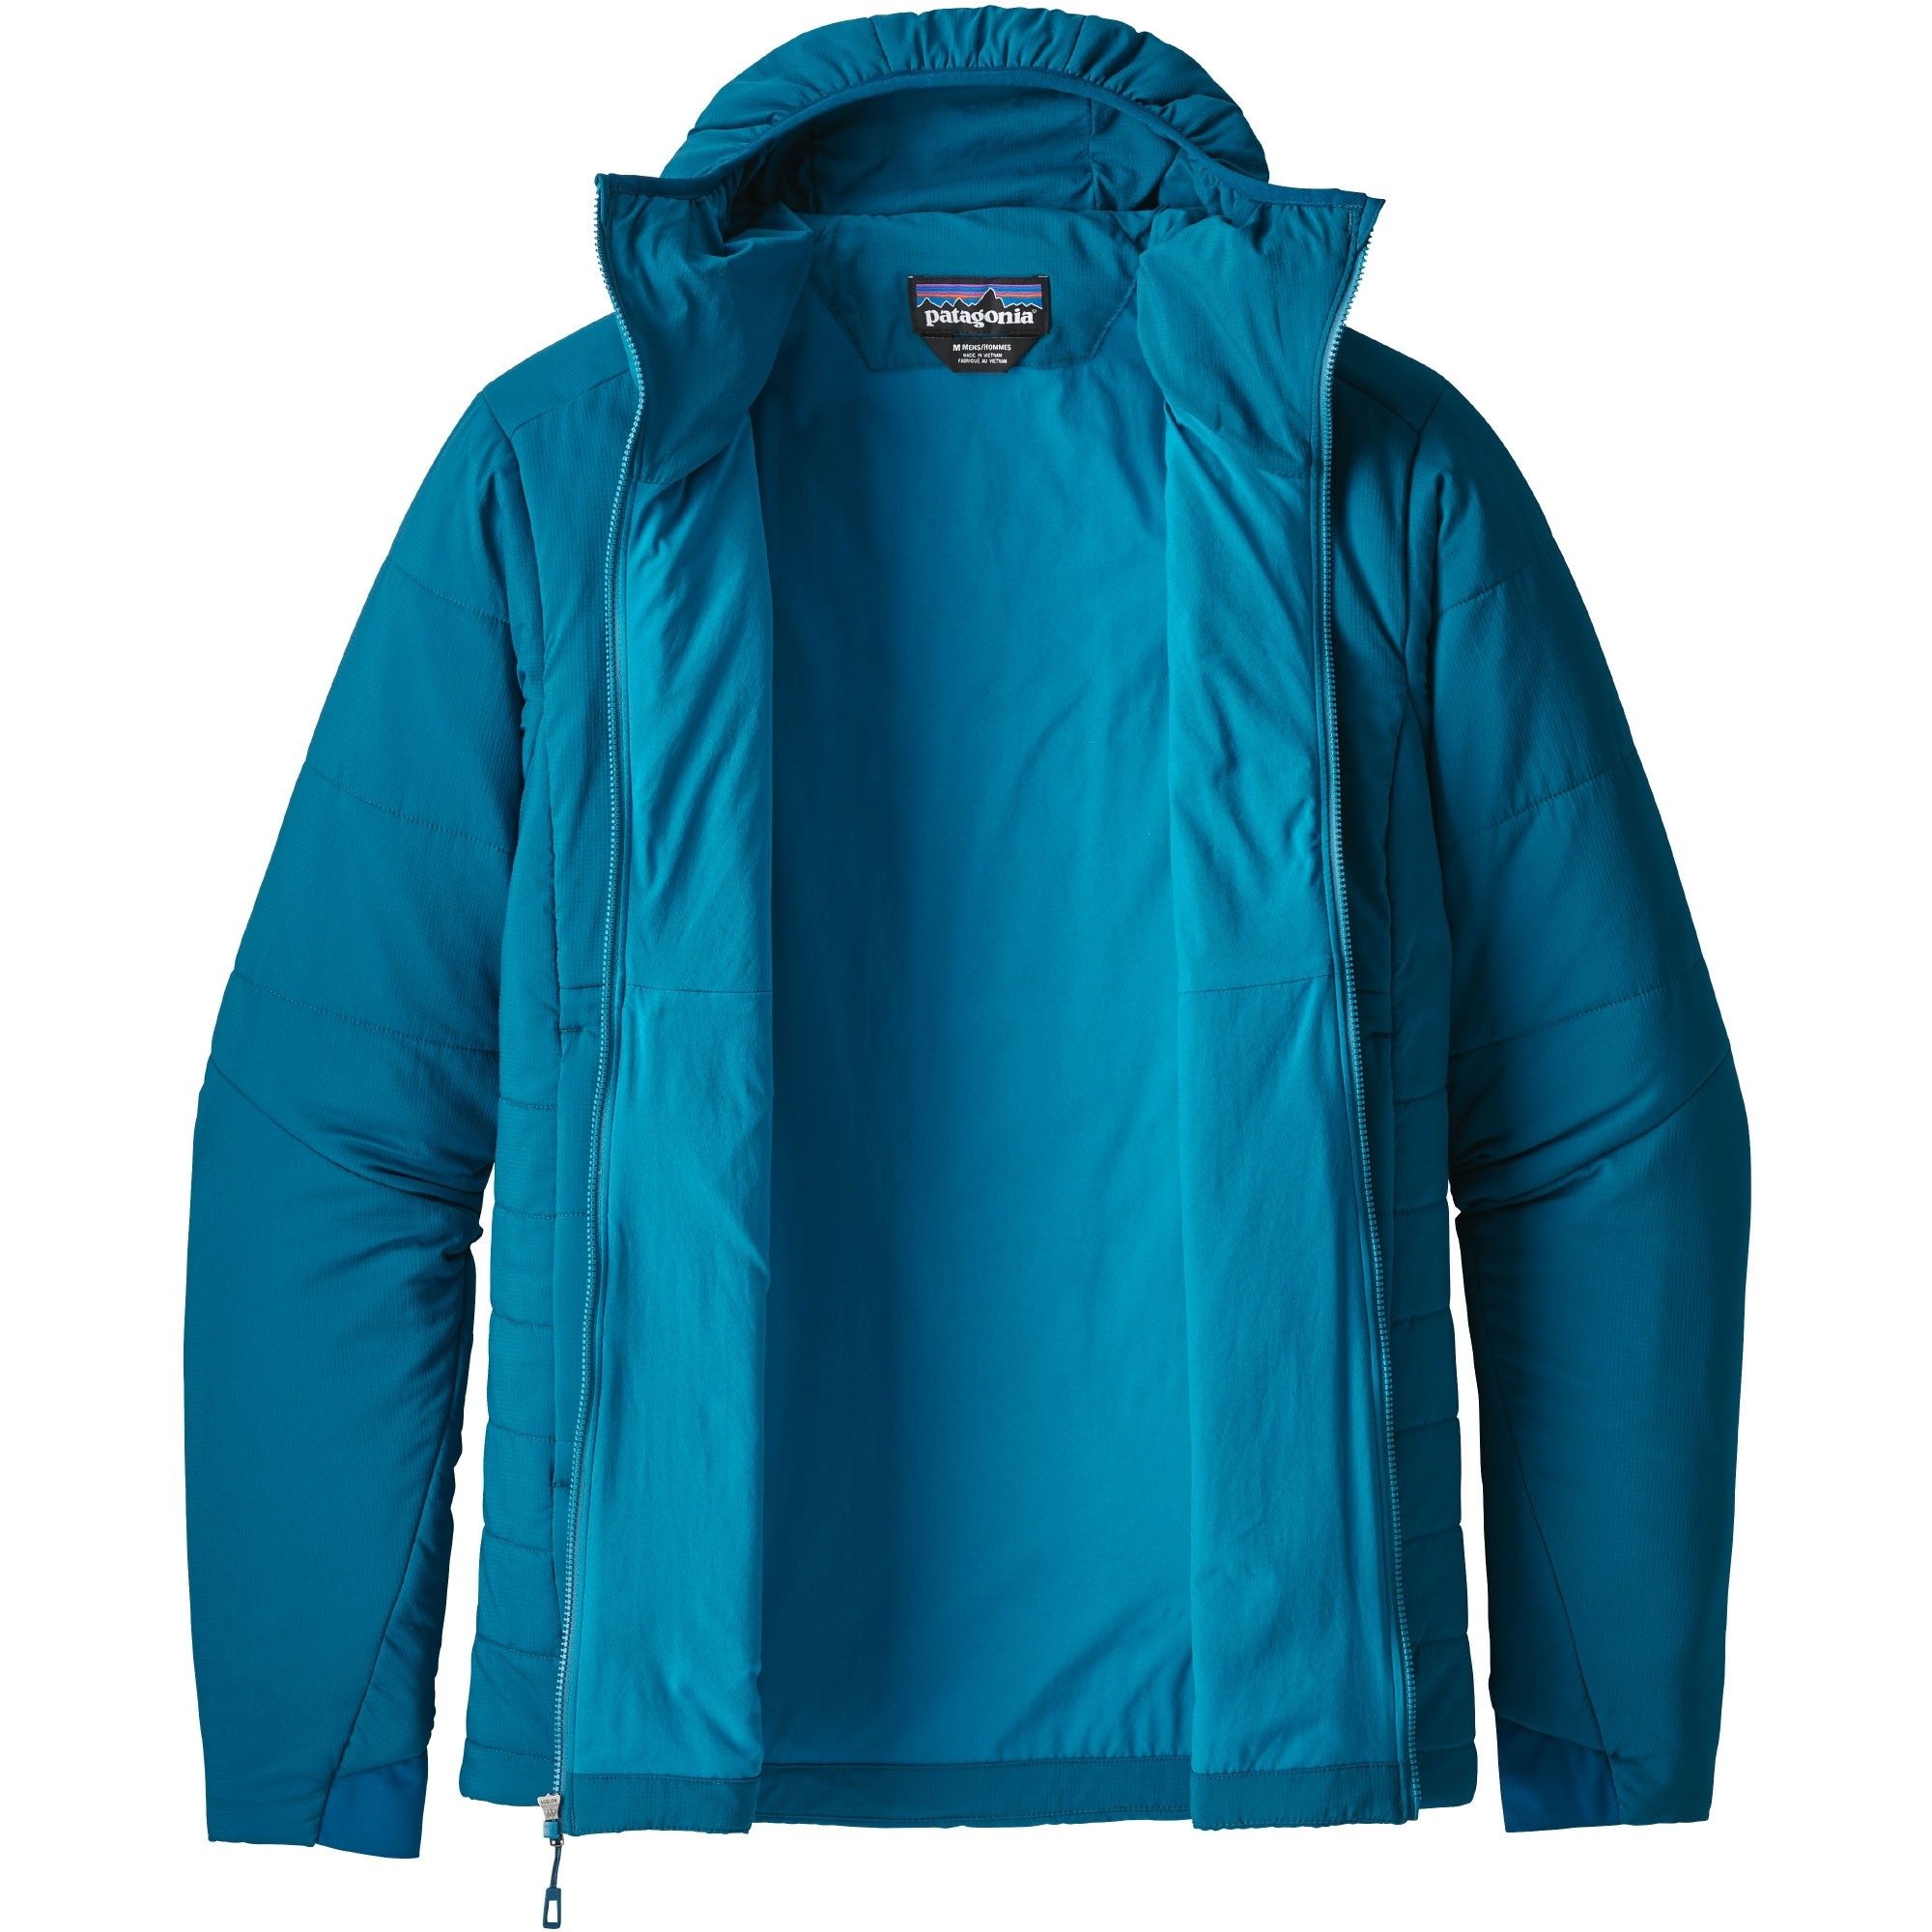 Patagonia Nano-Air Men's Hoody - Big Sur Blue - open